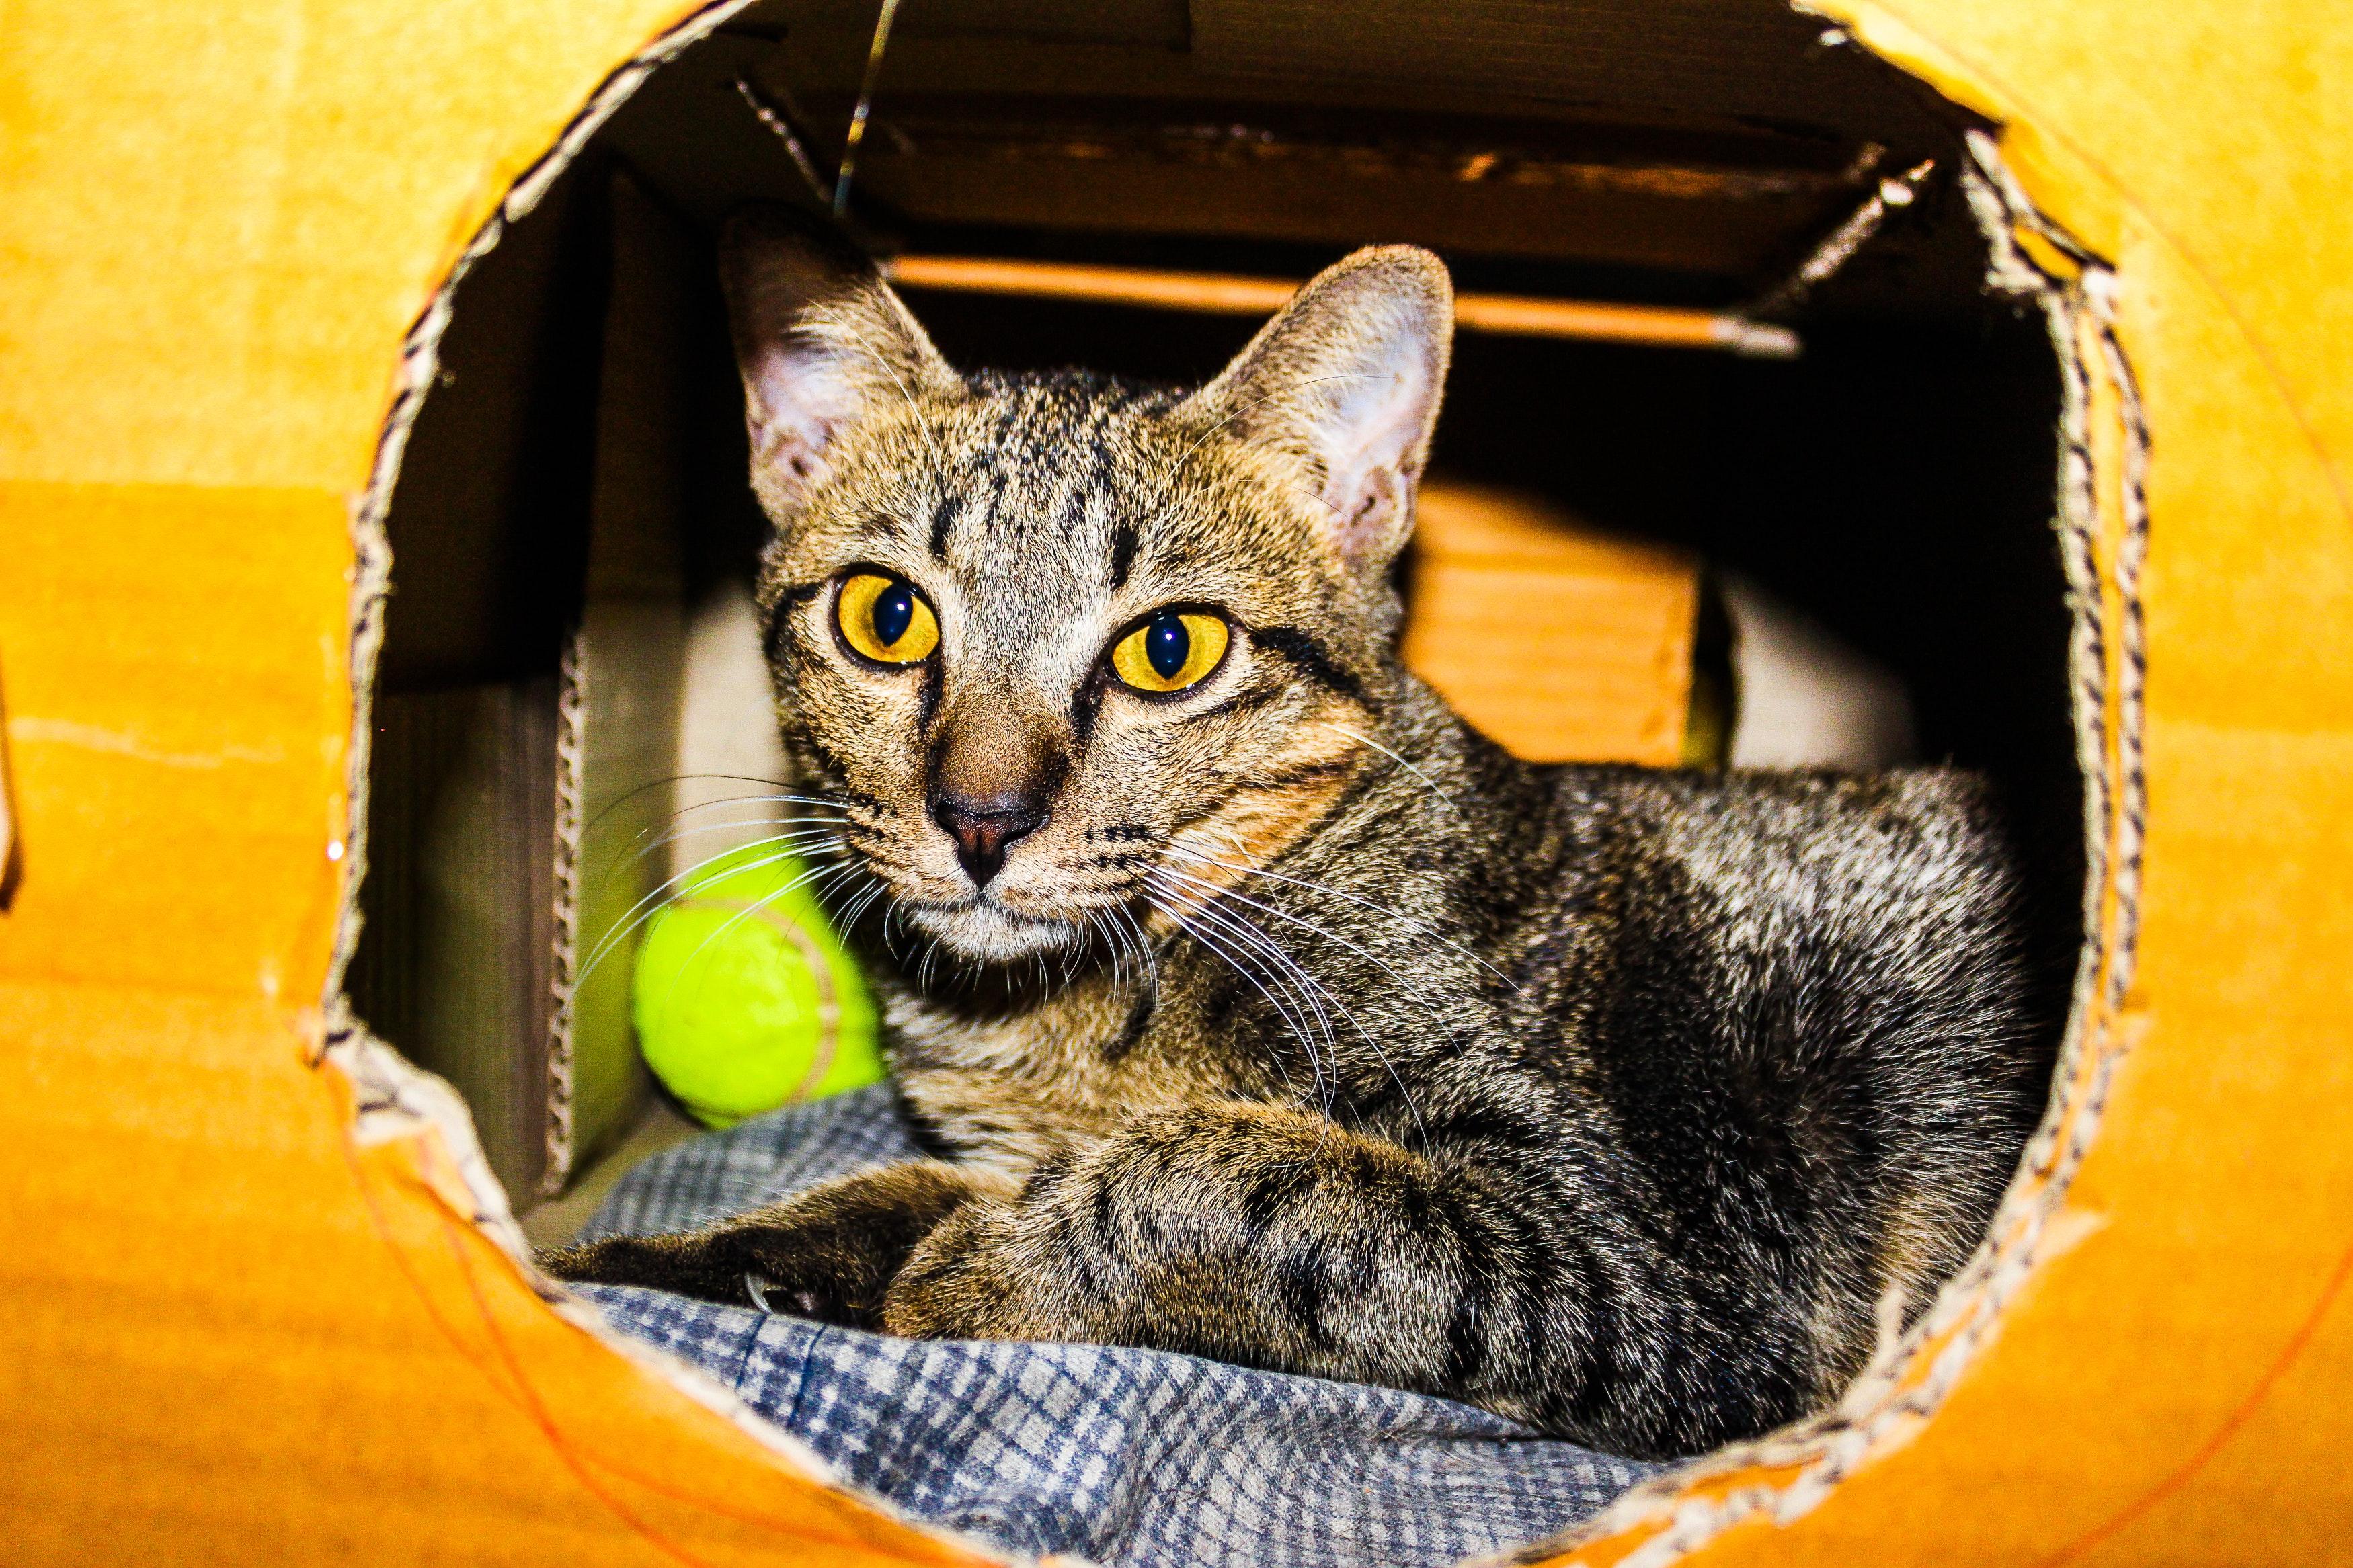 Silver Tabby Cat Inside a Brown Cardboard Box, Adorable, Posing, Mammal, Orange, HQ Photo